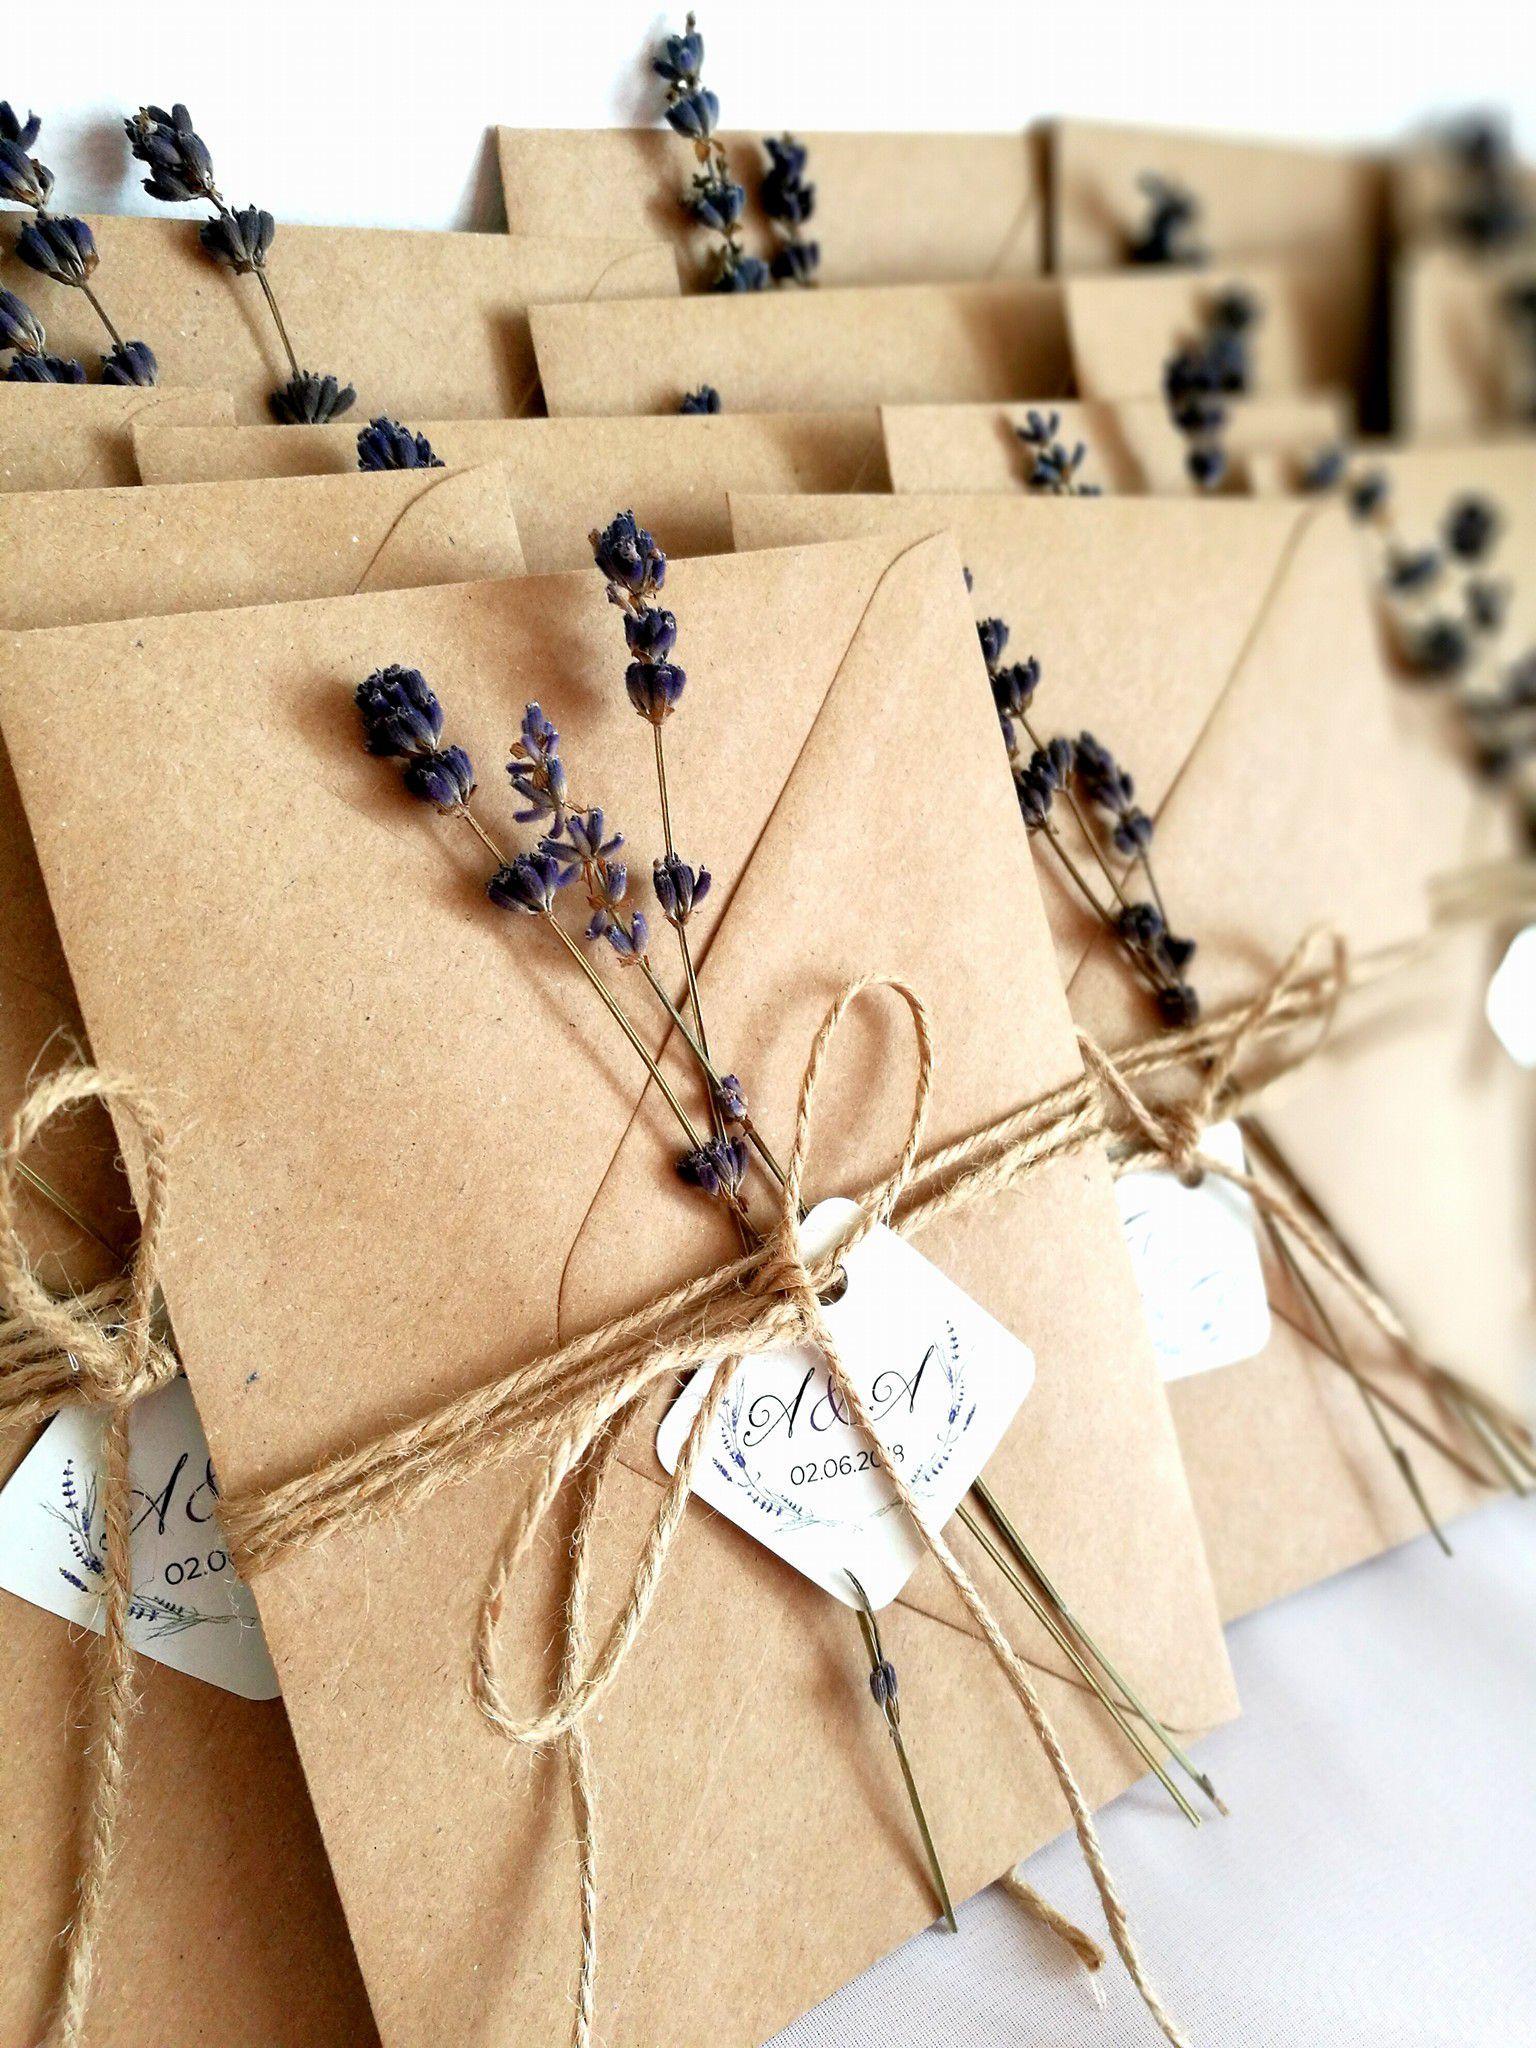 Invitatie nunta cu lavanda, invitatie rustica, invitatie flori, invitatie flori, lavanda | Breslo